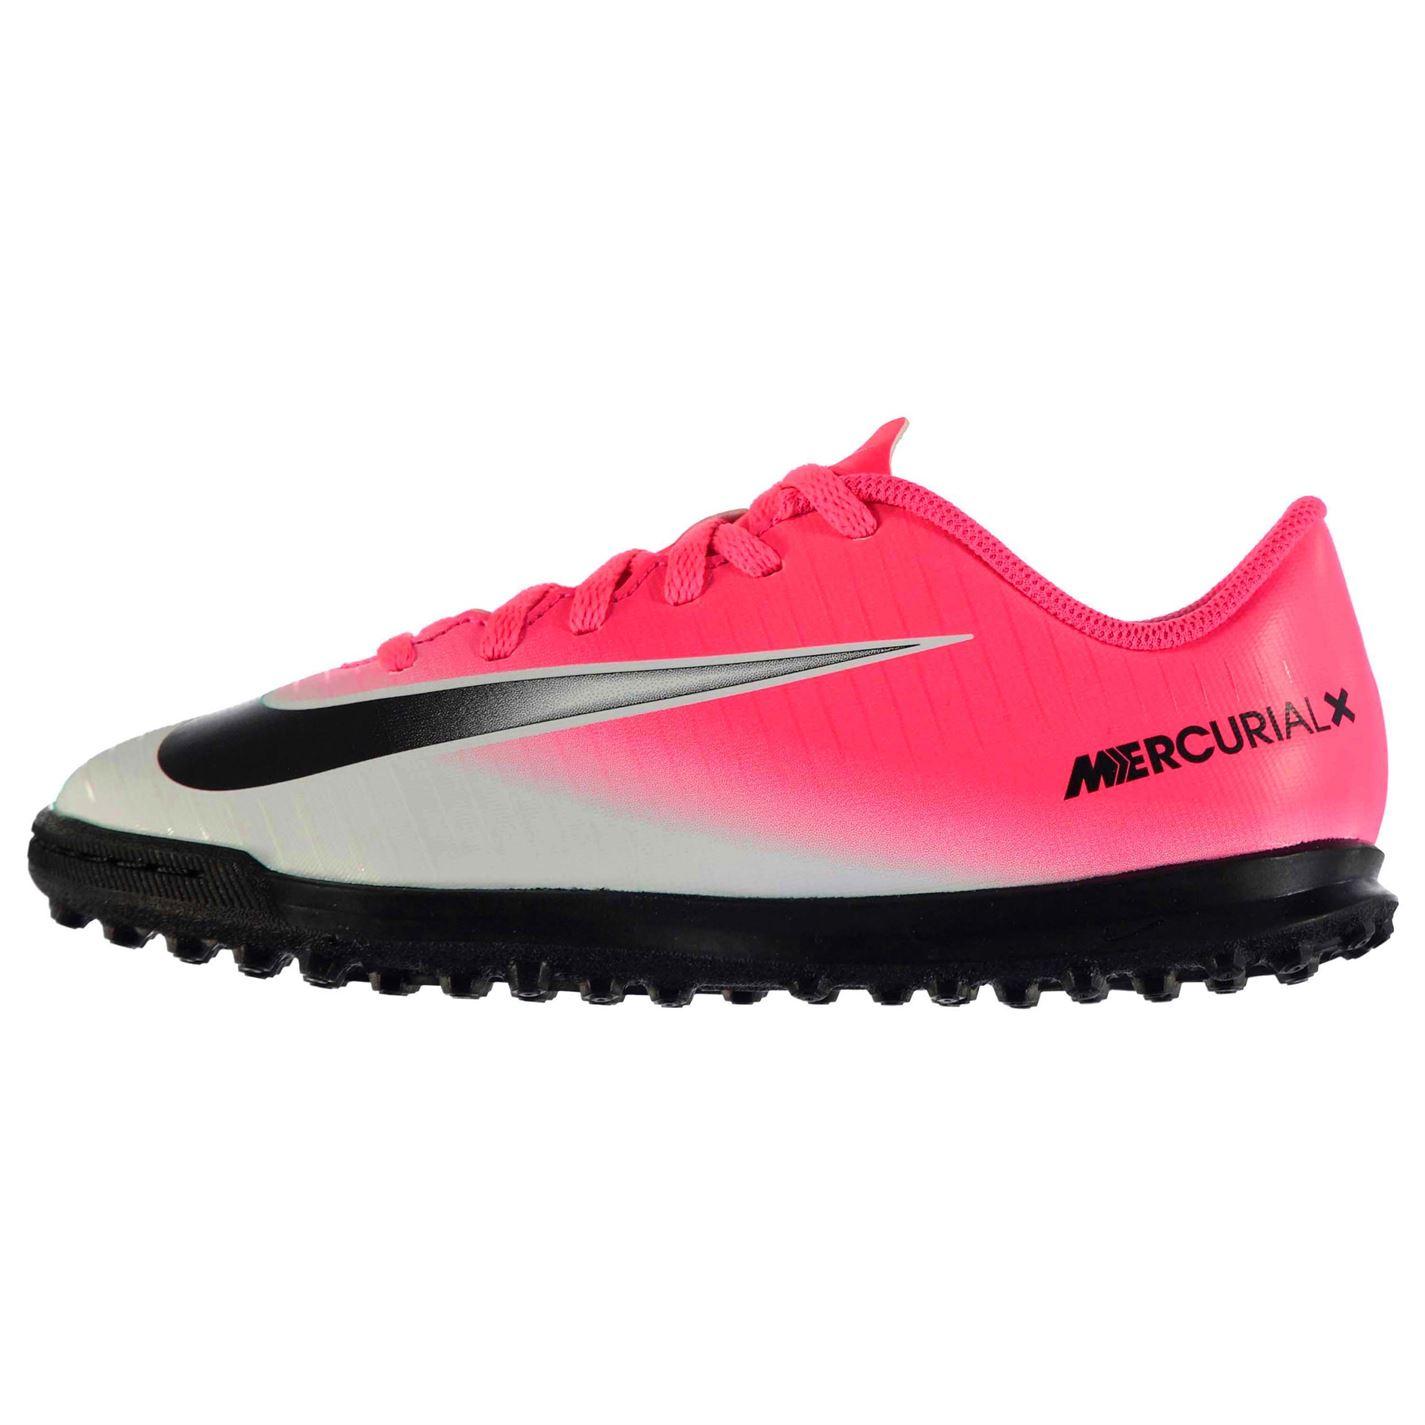 4a53d306f Nike Mercurial Vortex Astro Turf Trainers Junior